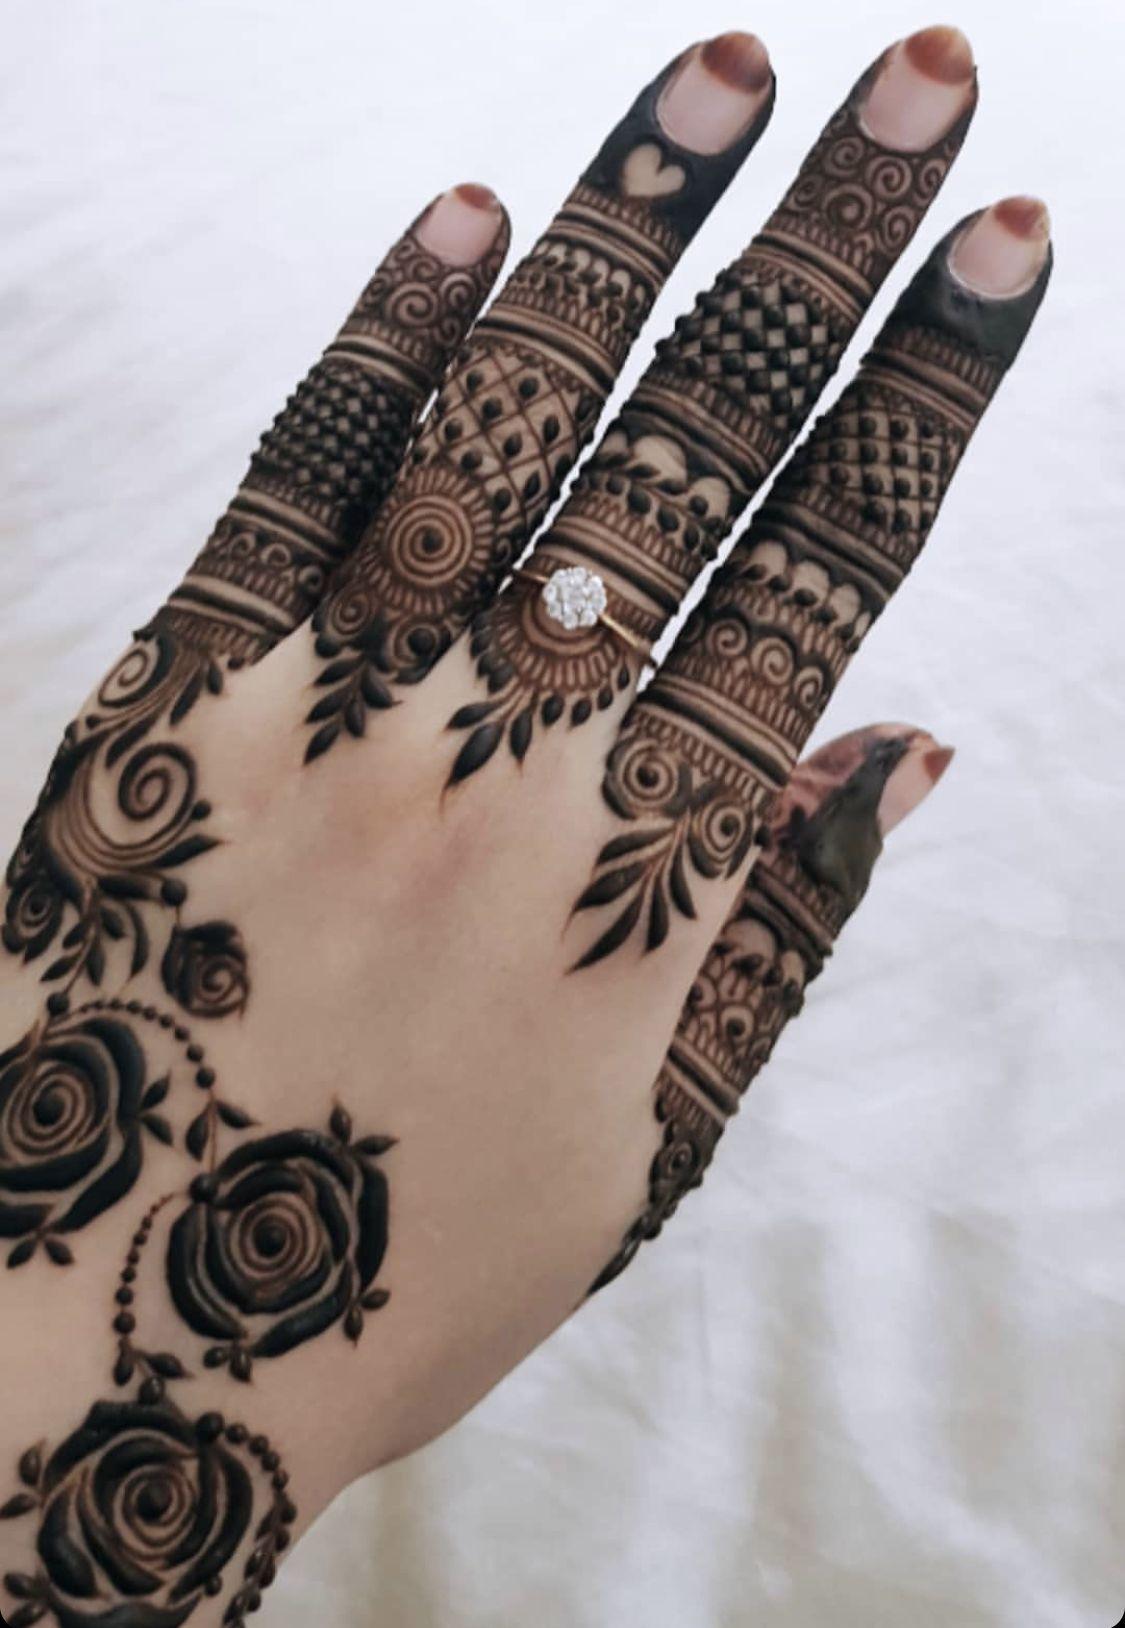 Pin By Vaishali Kulhar On Mehendi Modern Mehndi Designs Mehndi Designs For Fingers Finger Henna Designs